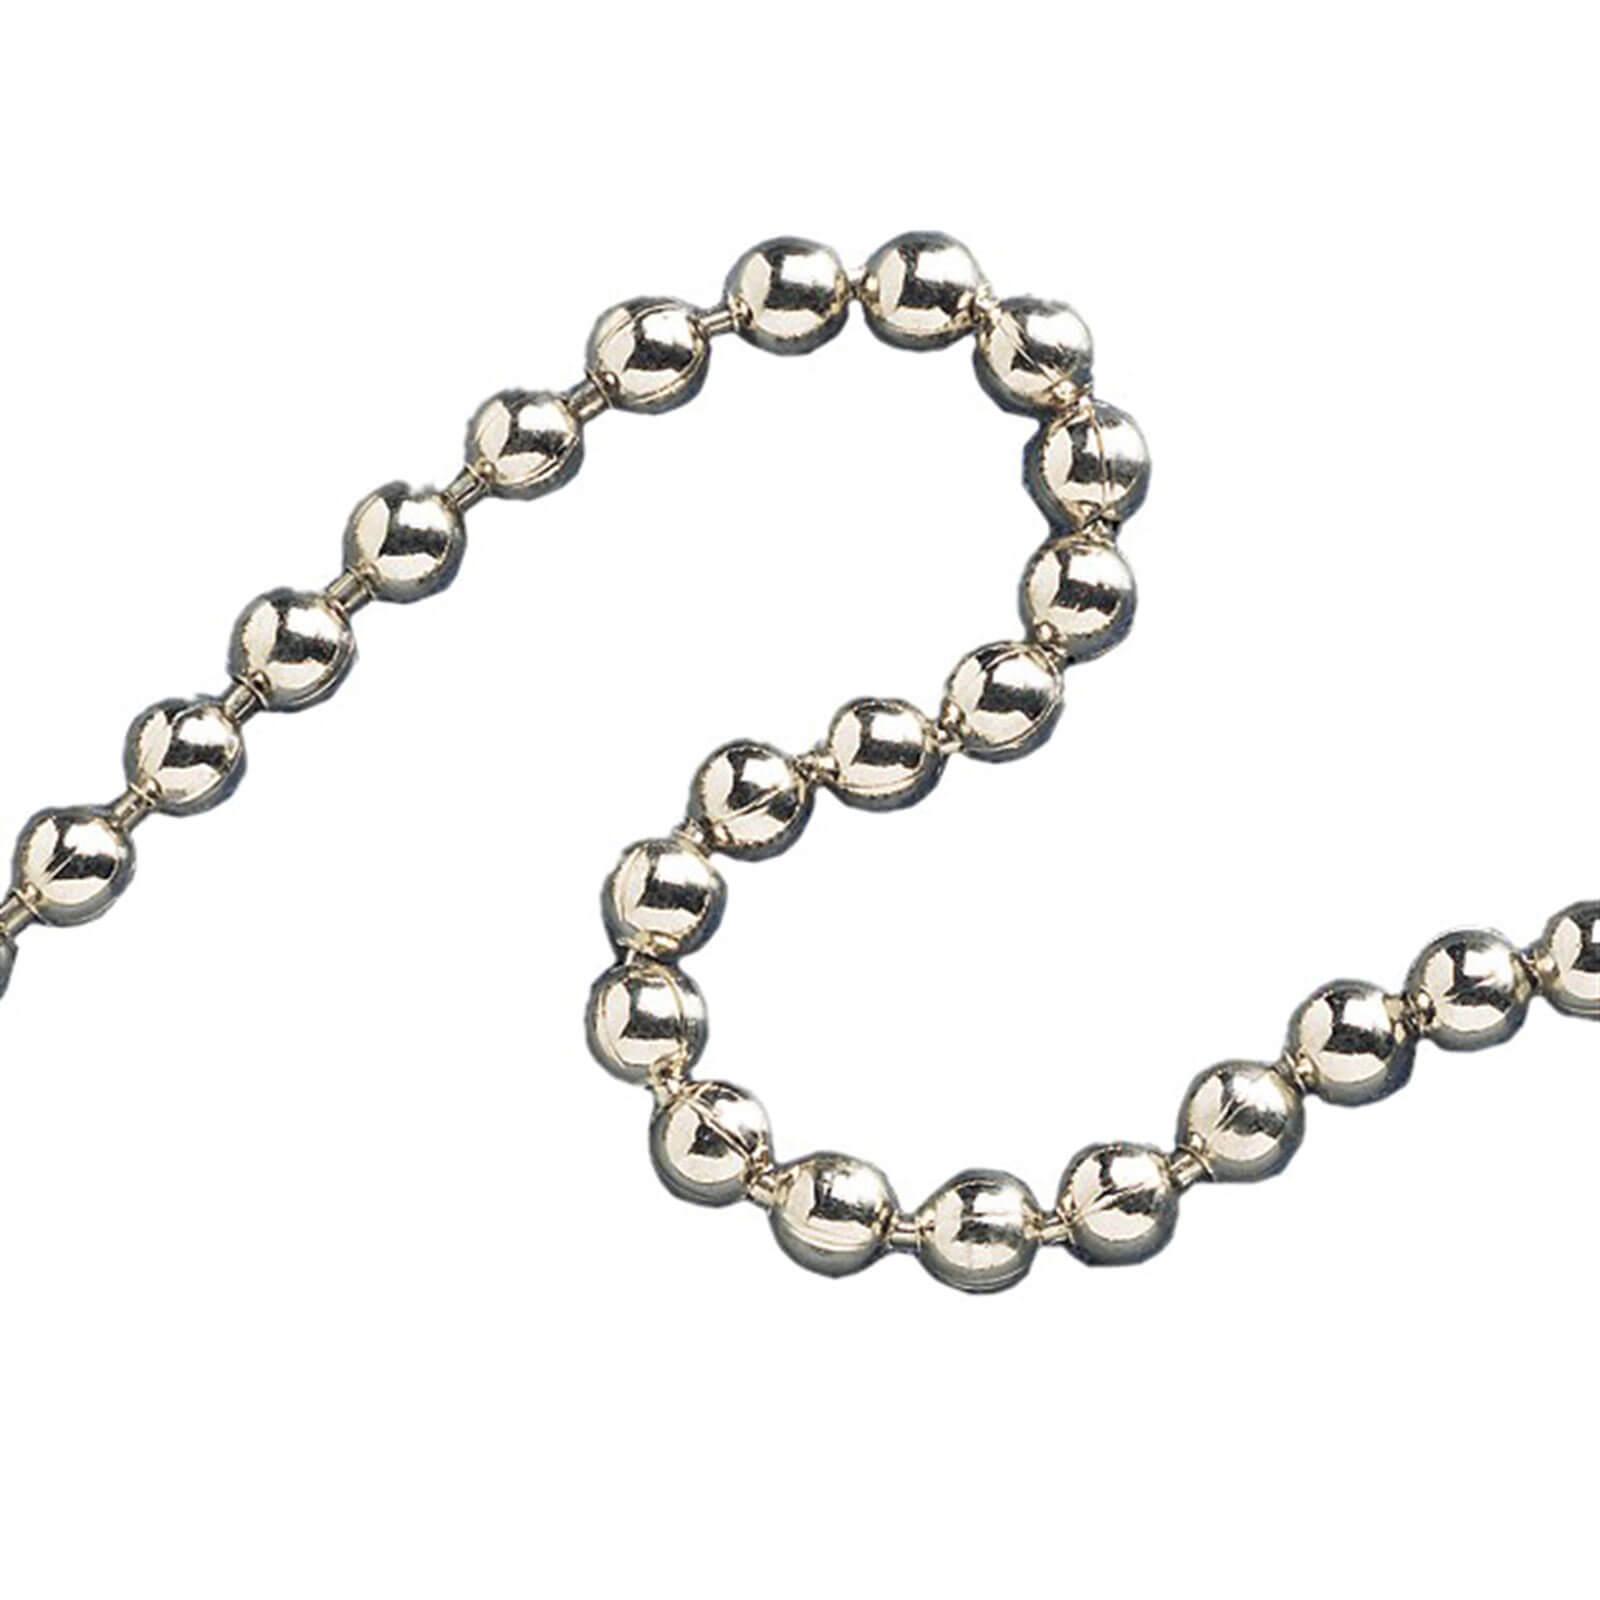 Image of Faithfull Ball Chain Chrome 3.2mm 10m